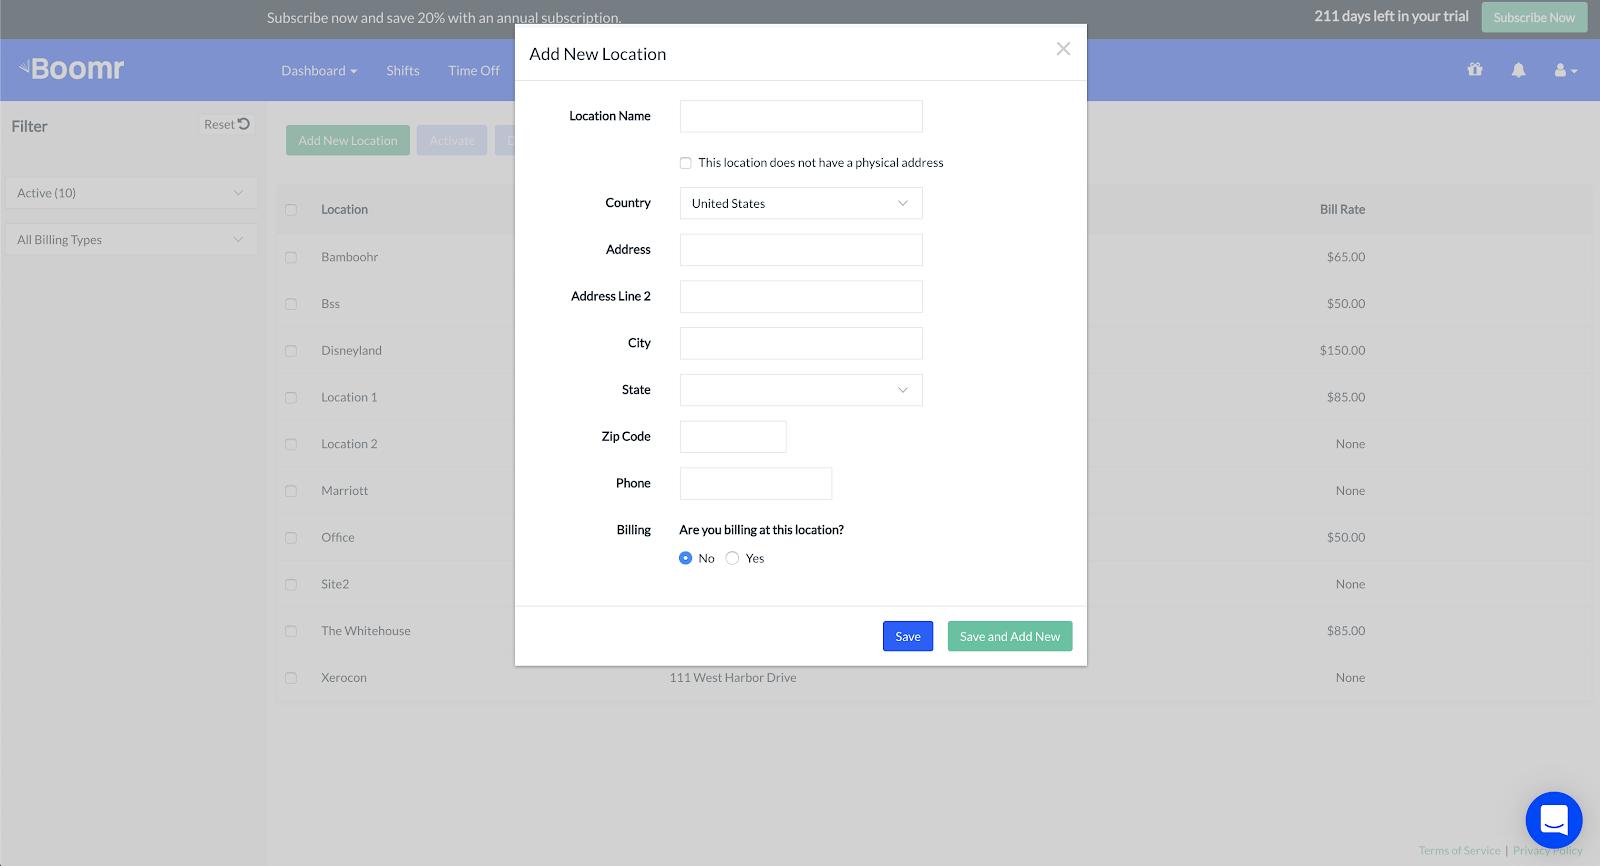 Screenshot showing the 'Add New Location' screen